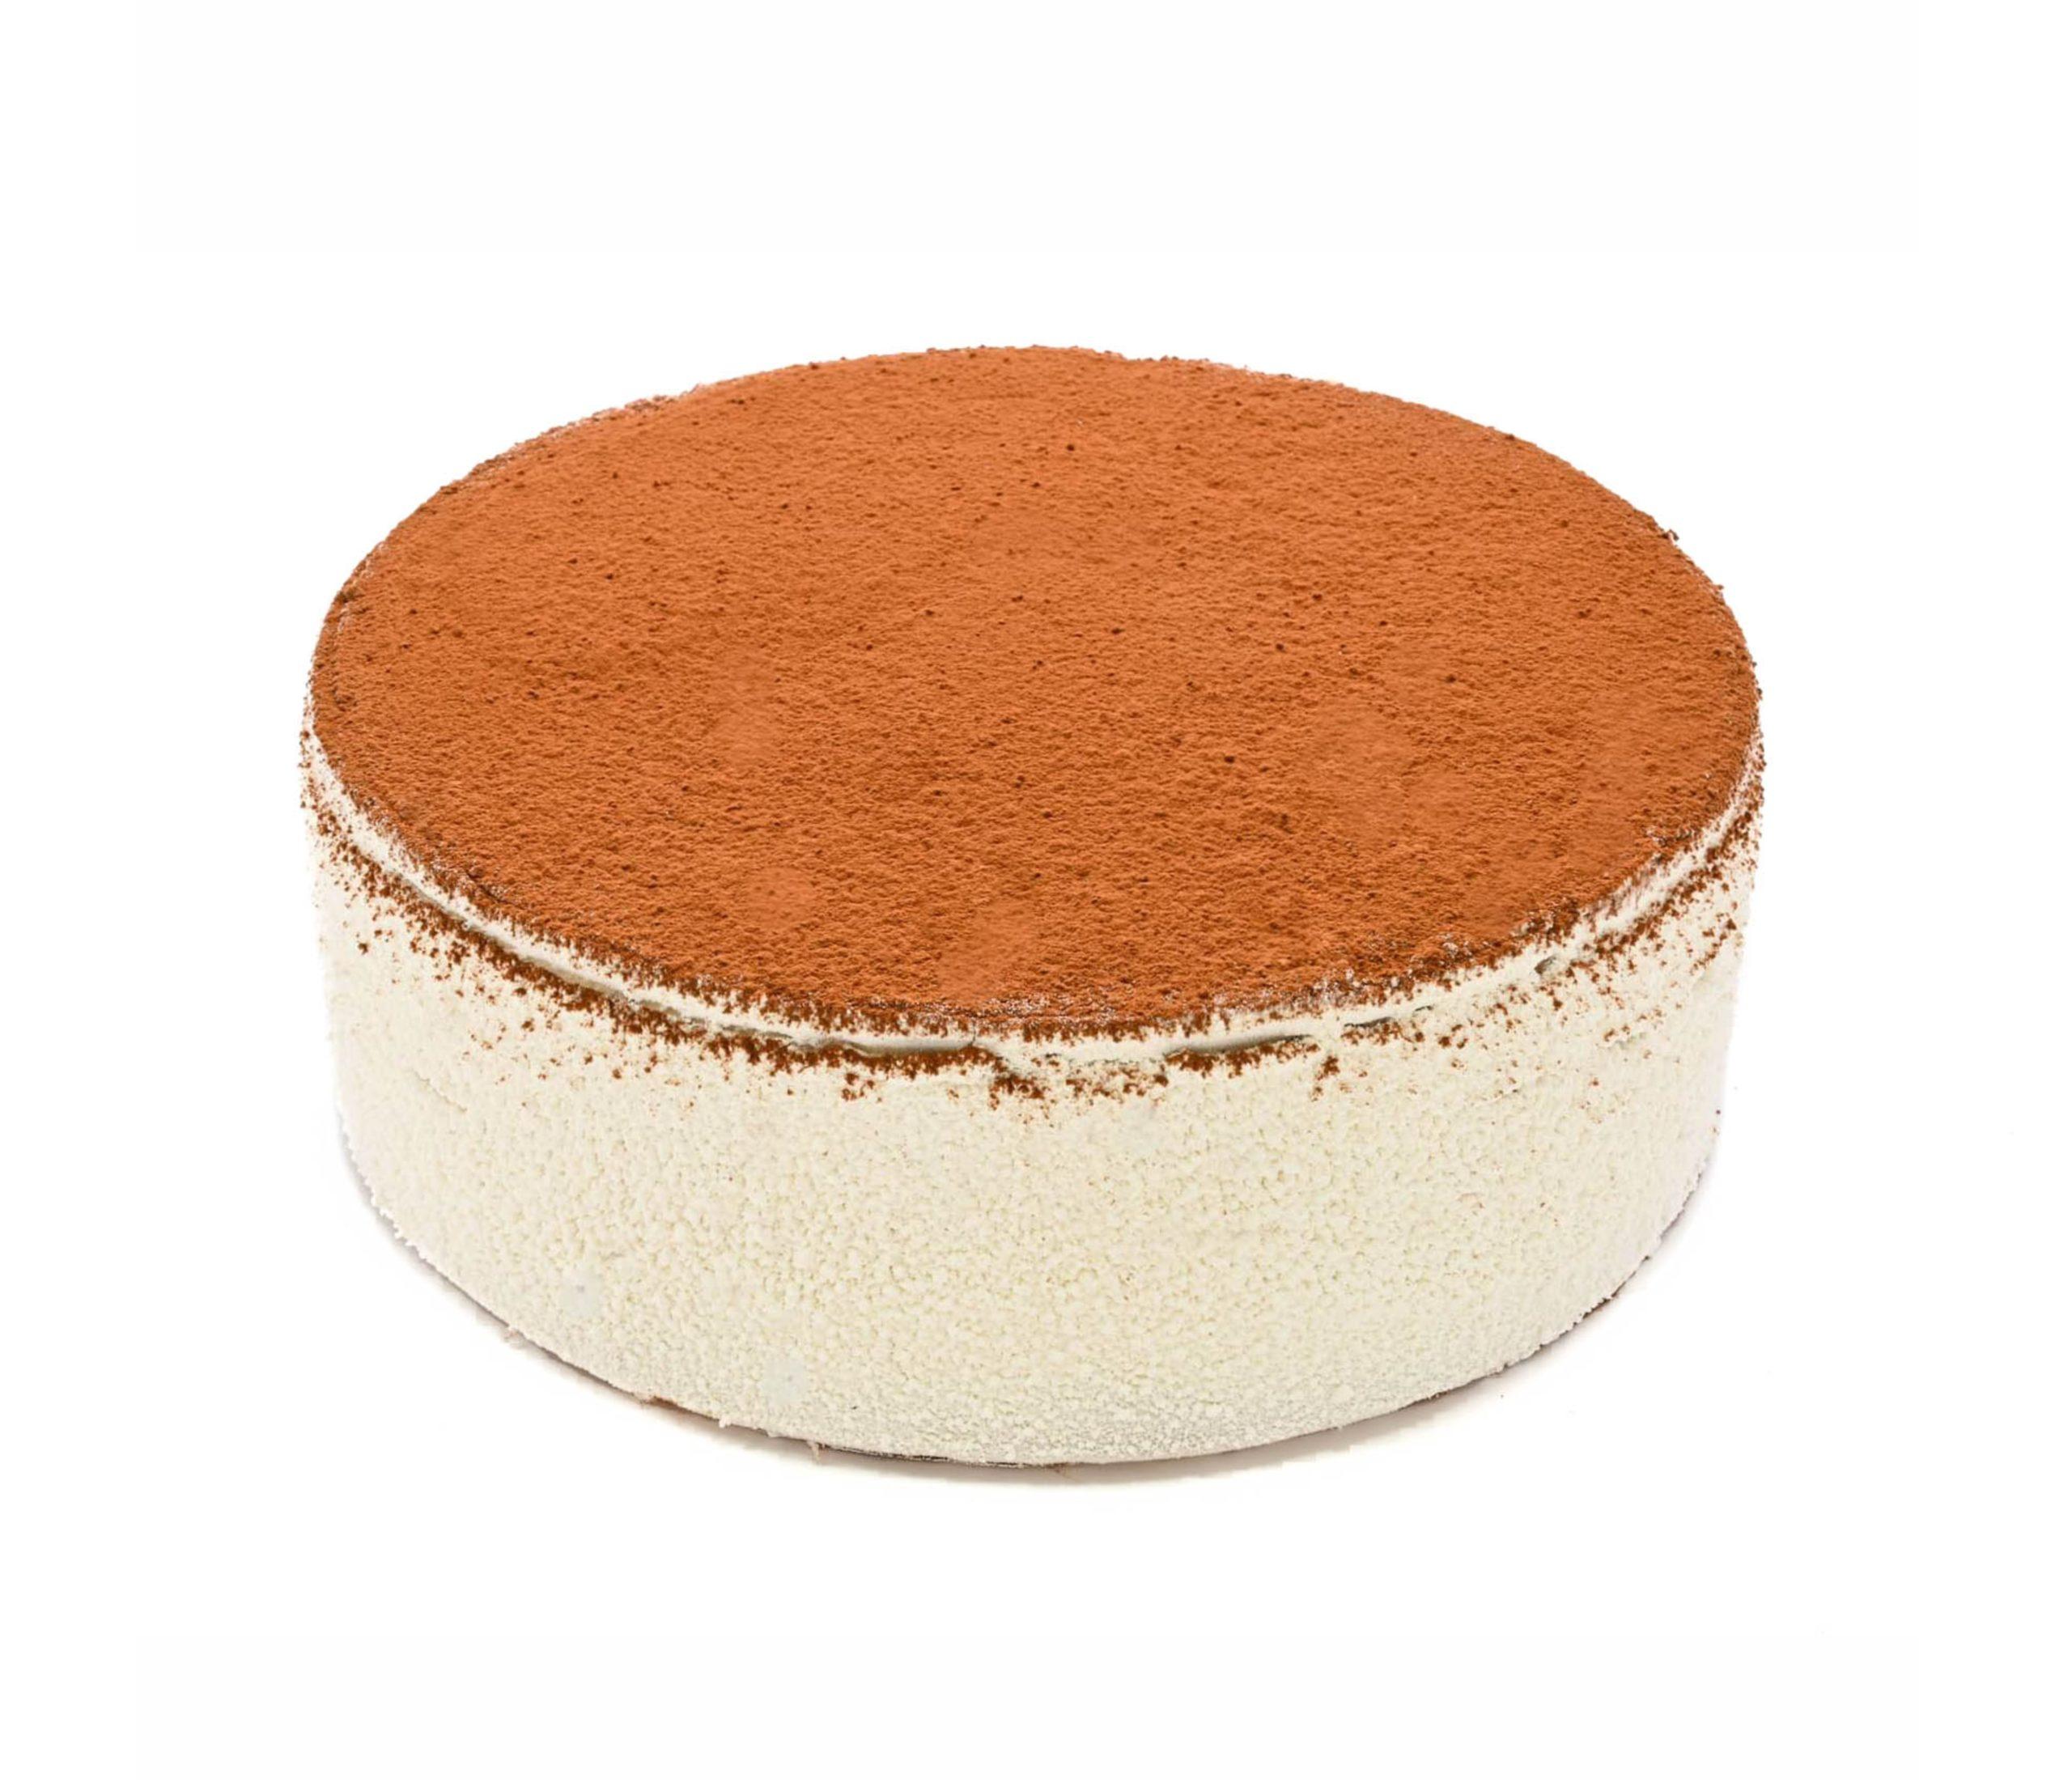 Tiramisu Gelato Cake